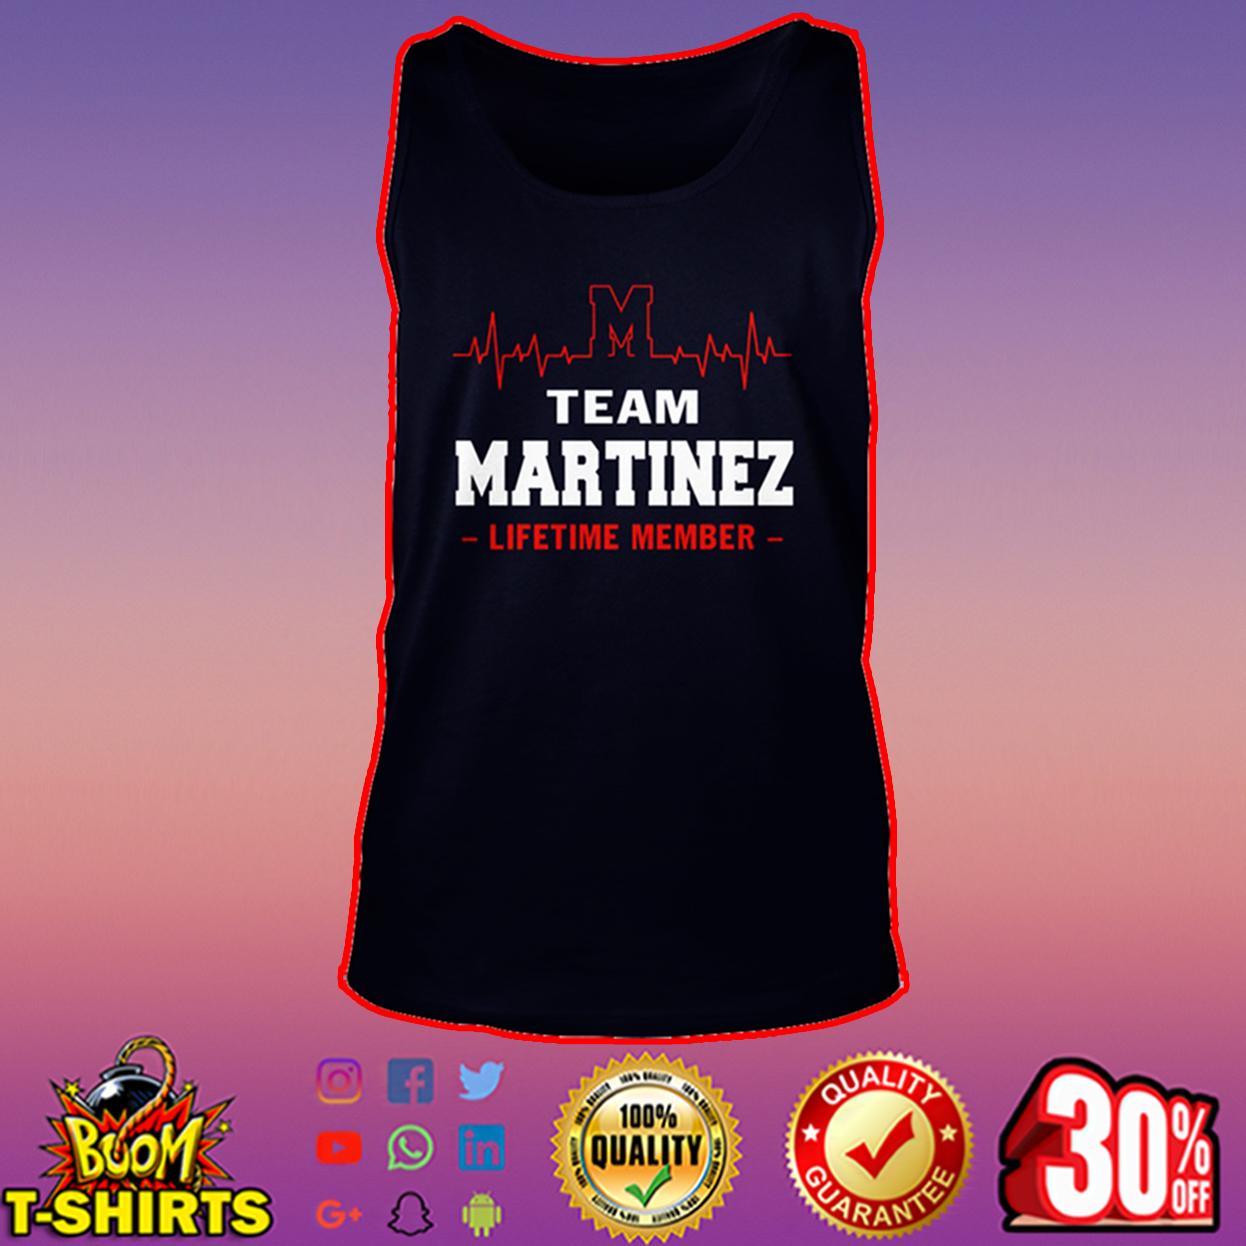 Team Martinez lifetime member tank top